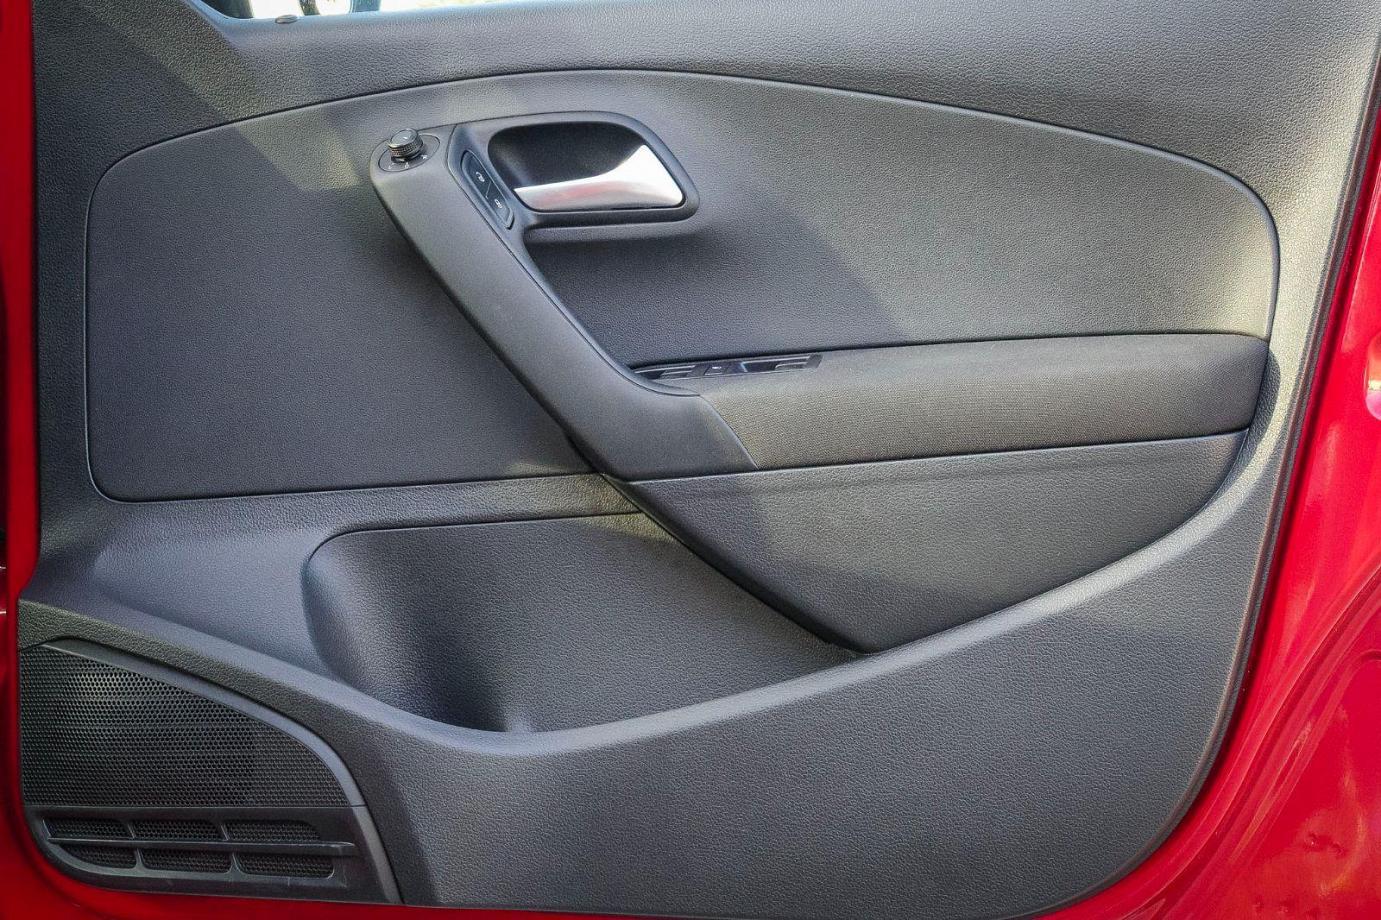 2015 Volkswagen Polo 6R MY16 66TSI Trendline Hatchback 5dr DSG 7sp 1.2T